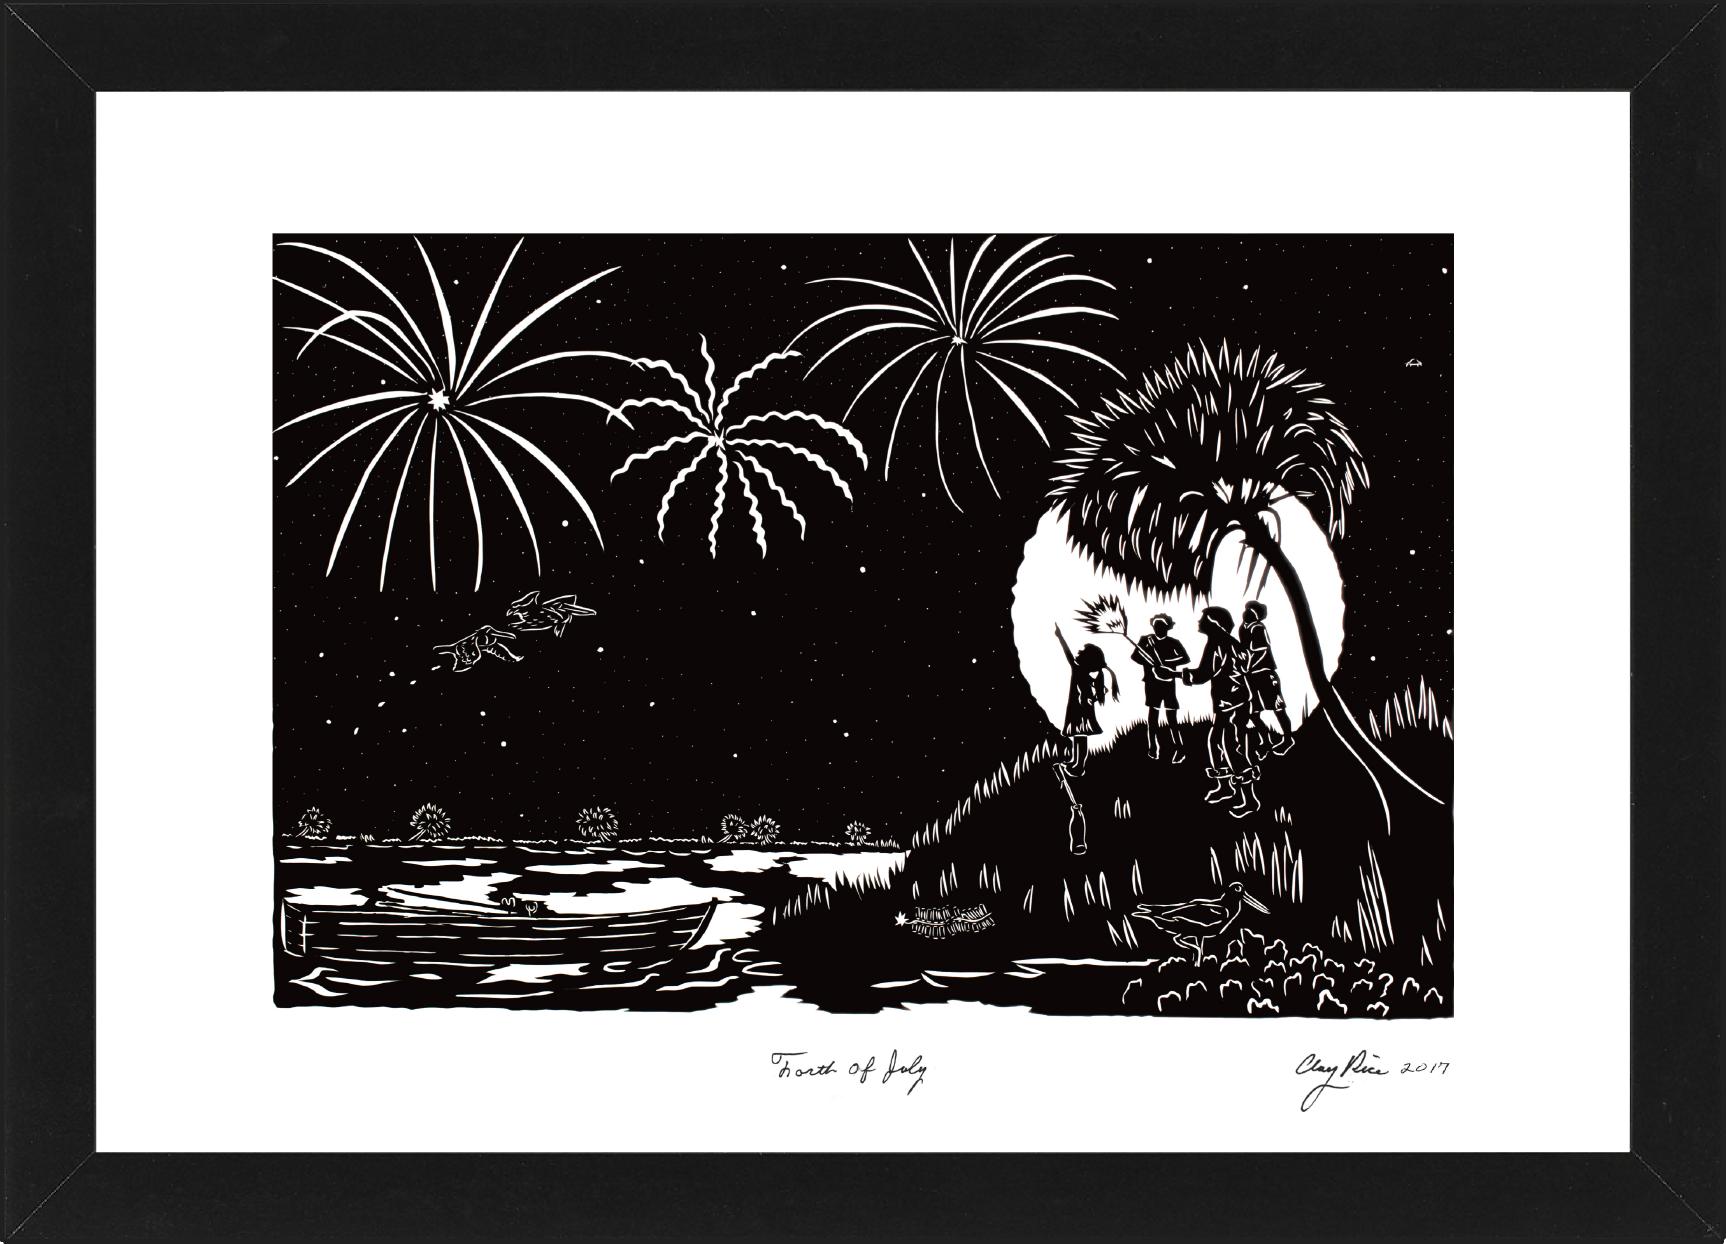 silhouette of people lighting fireworks